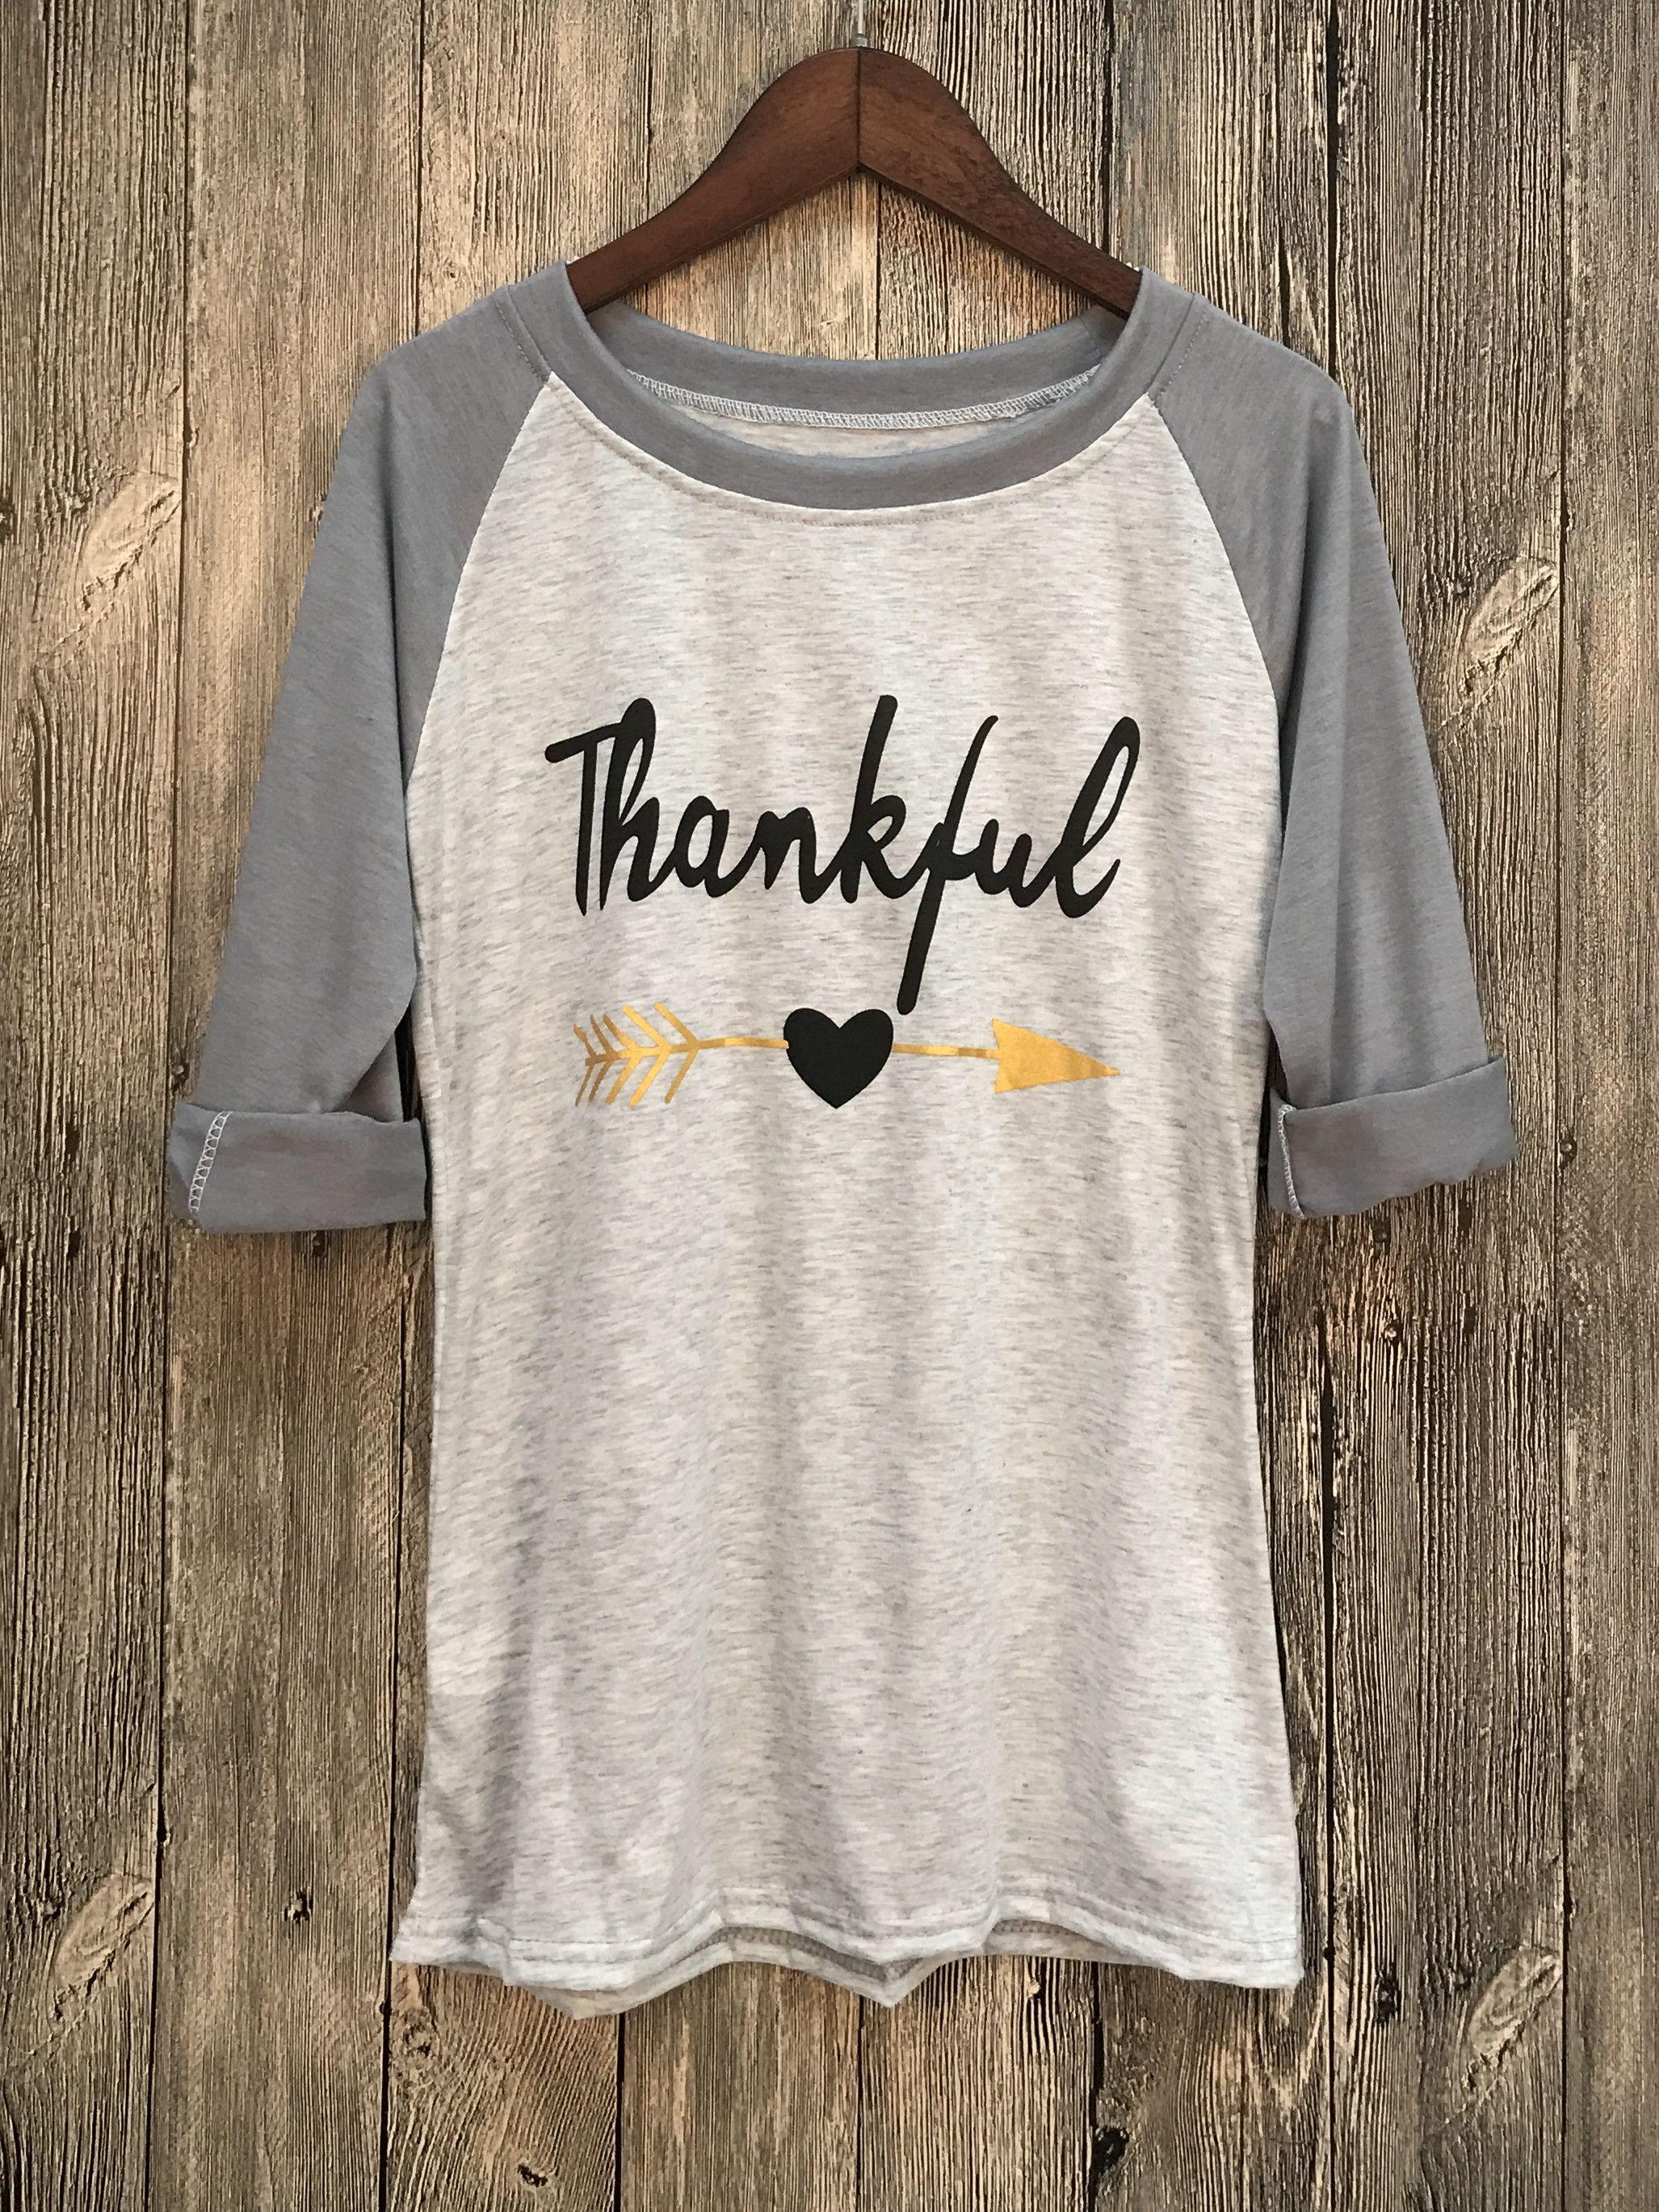 Thankful Printed Raglan Tee Shirt All Dressed Up Shirts Tee